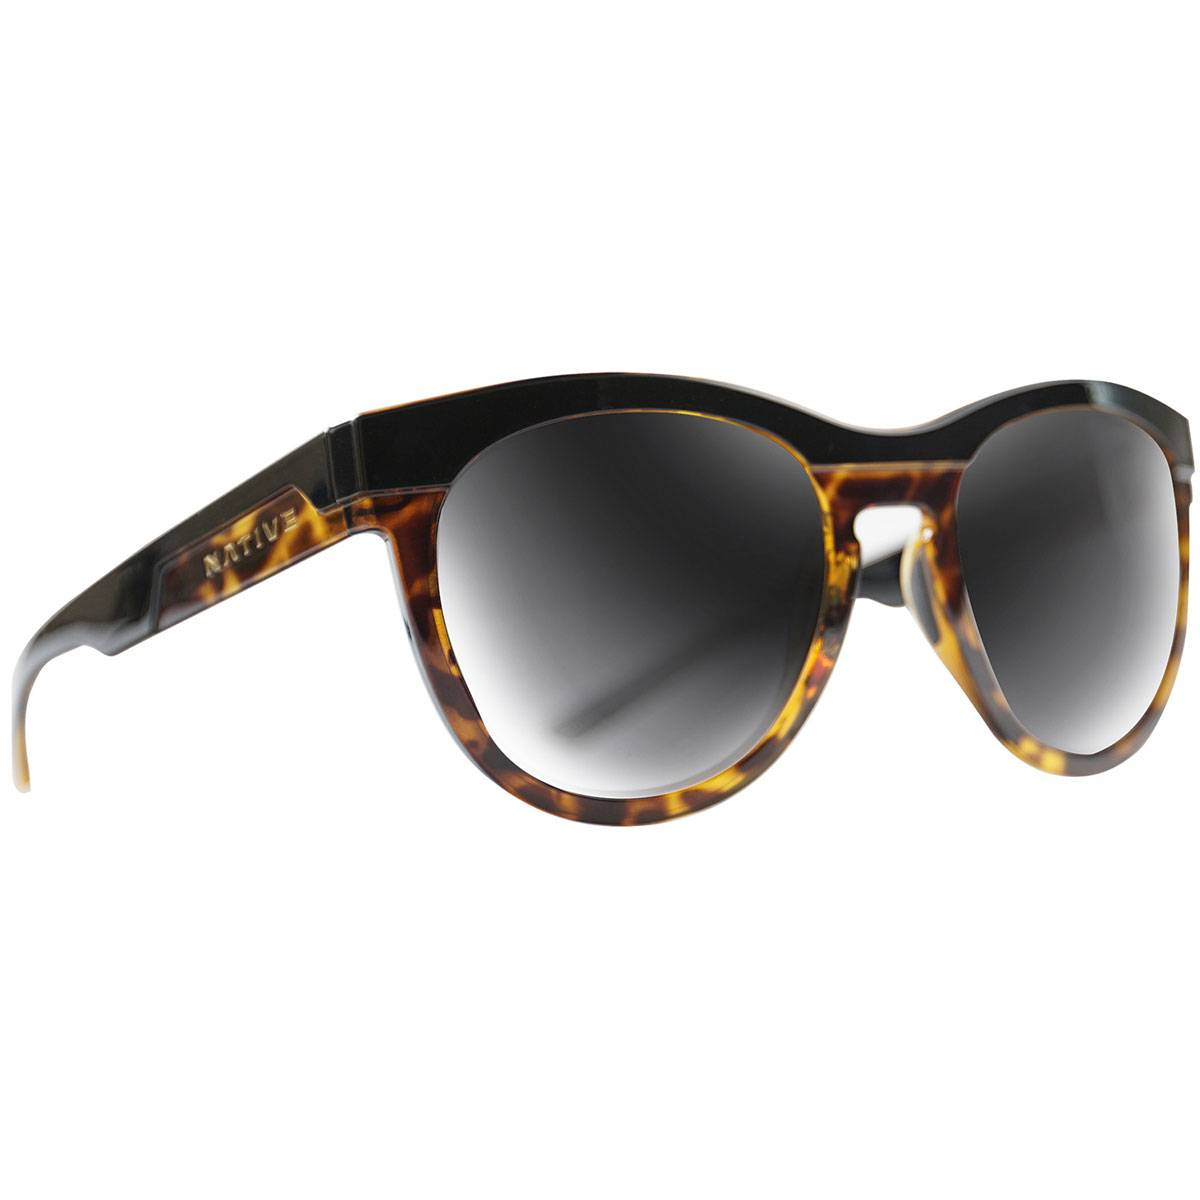 Native Eyewear La Reina Sunglasses